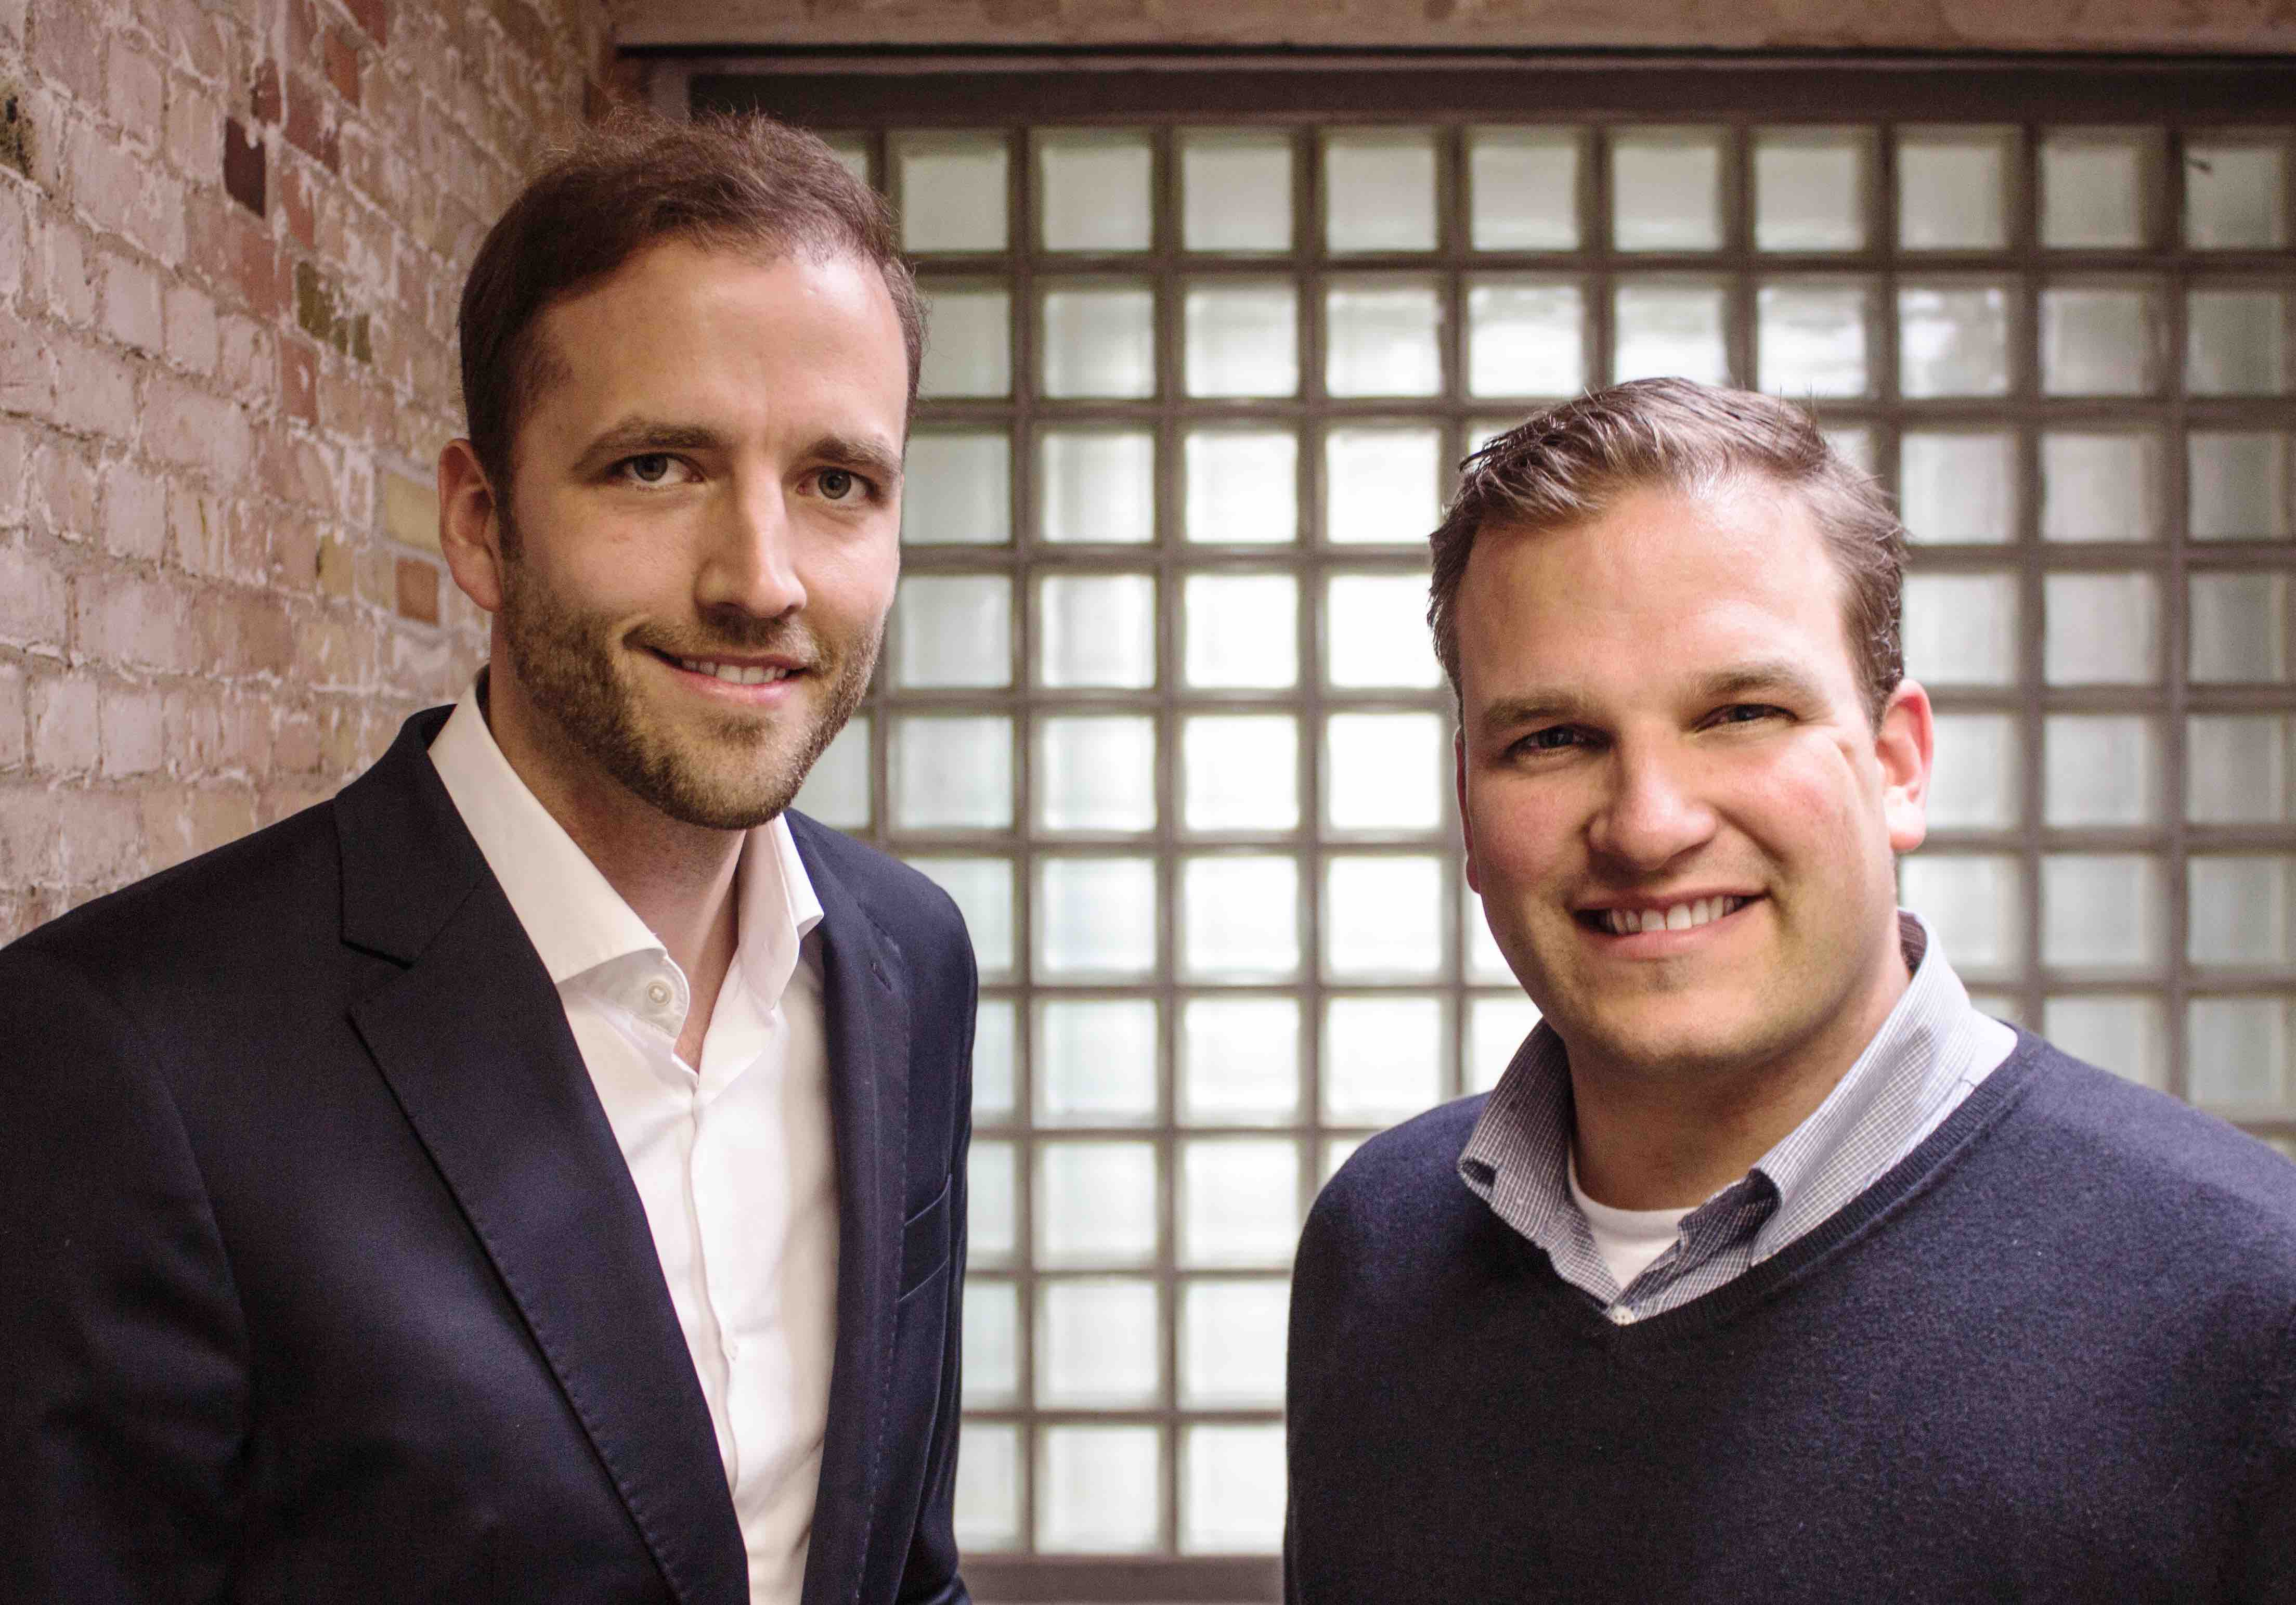 Fabian Kienbaum und Philipp Depiereux